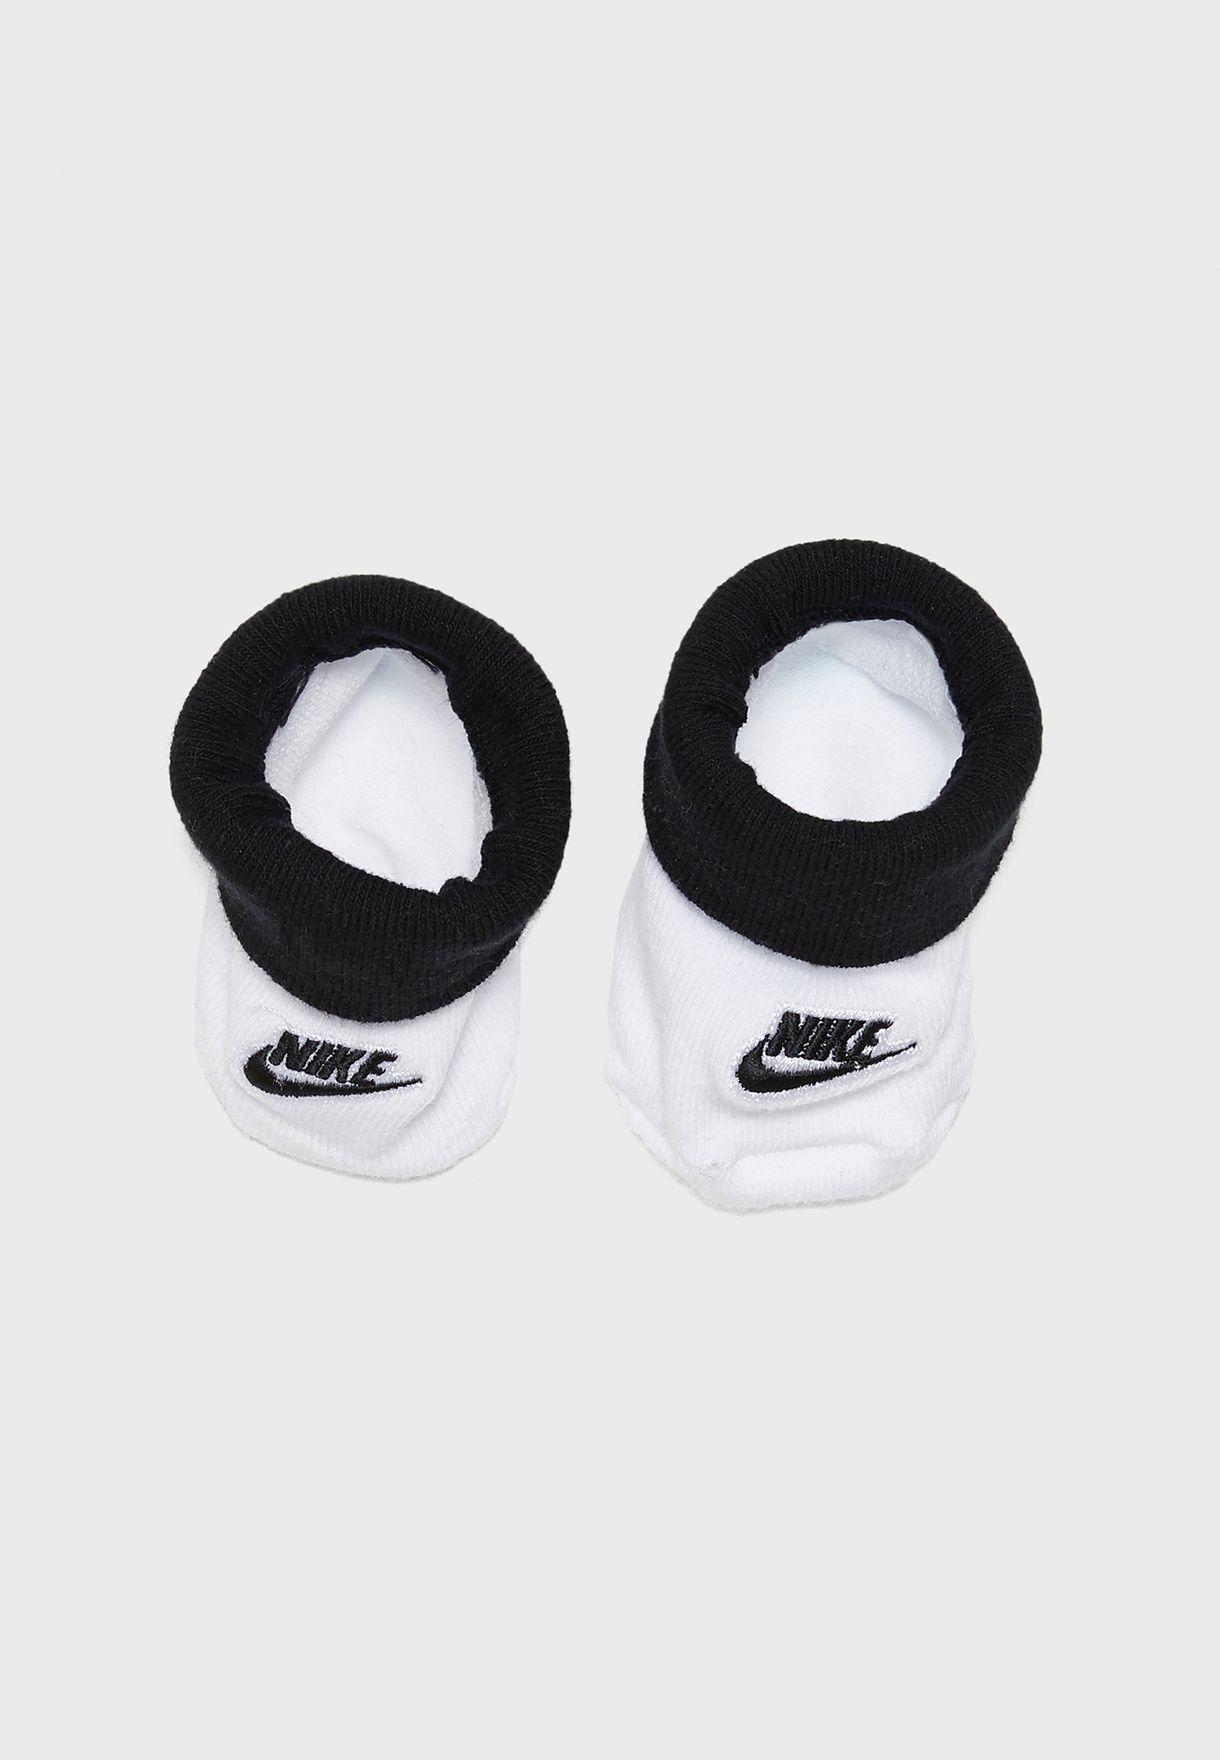 طقم (افرول + كاب + حذاء بيبي)